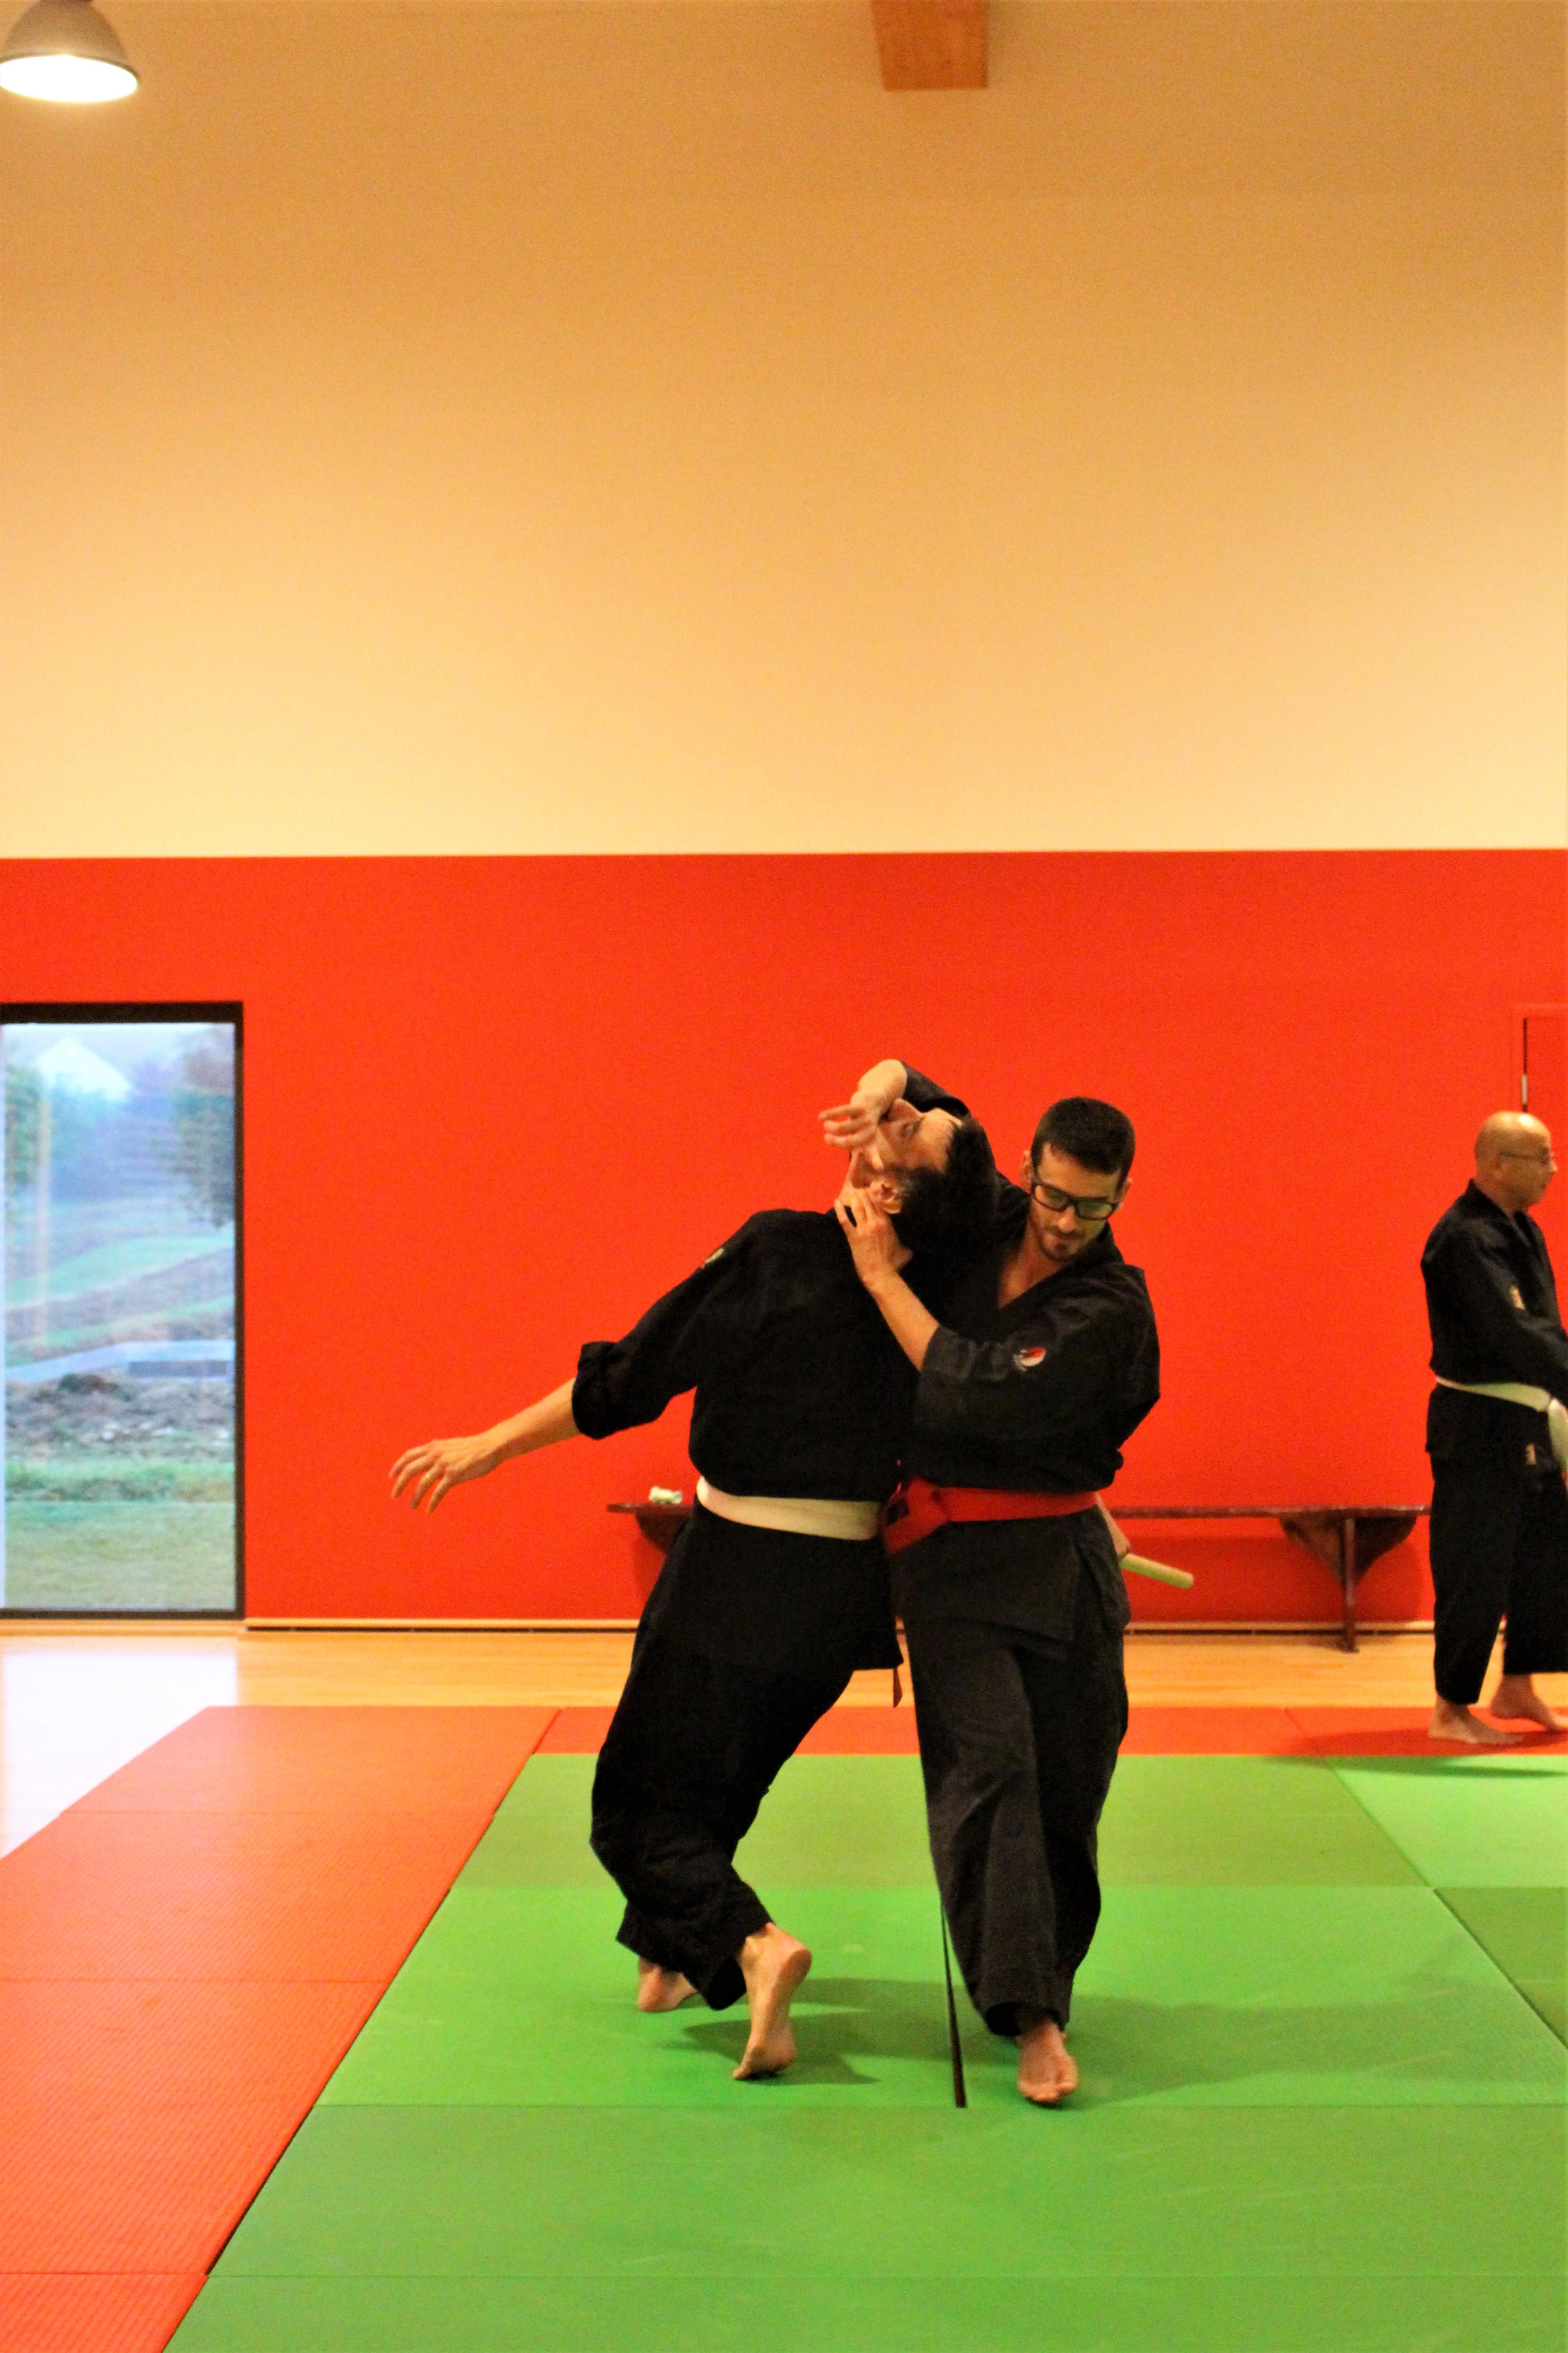 Mushin Ryu Ju Jutsu - Irimi nage